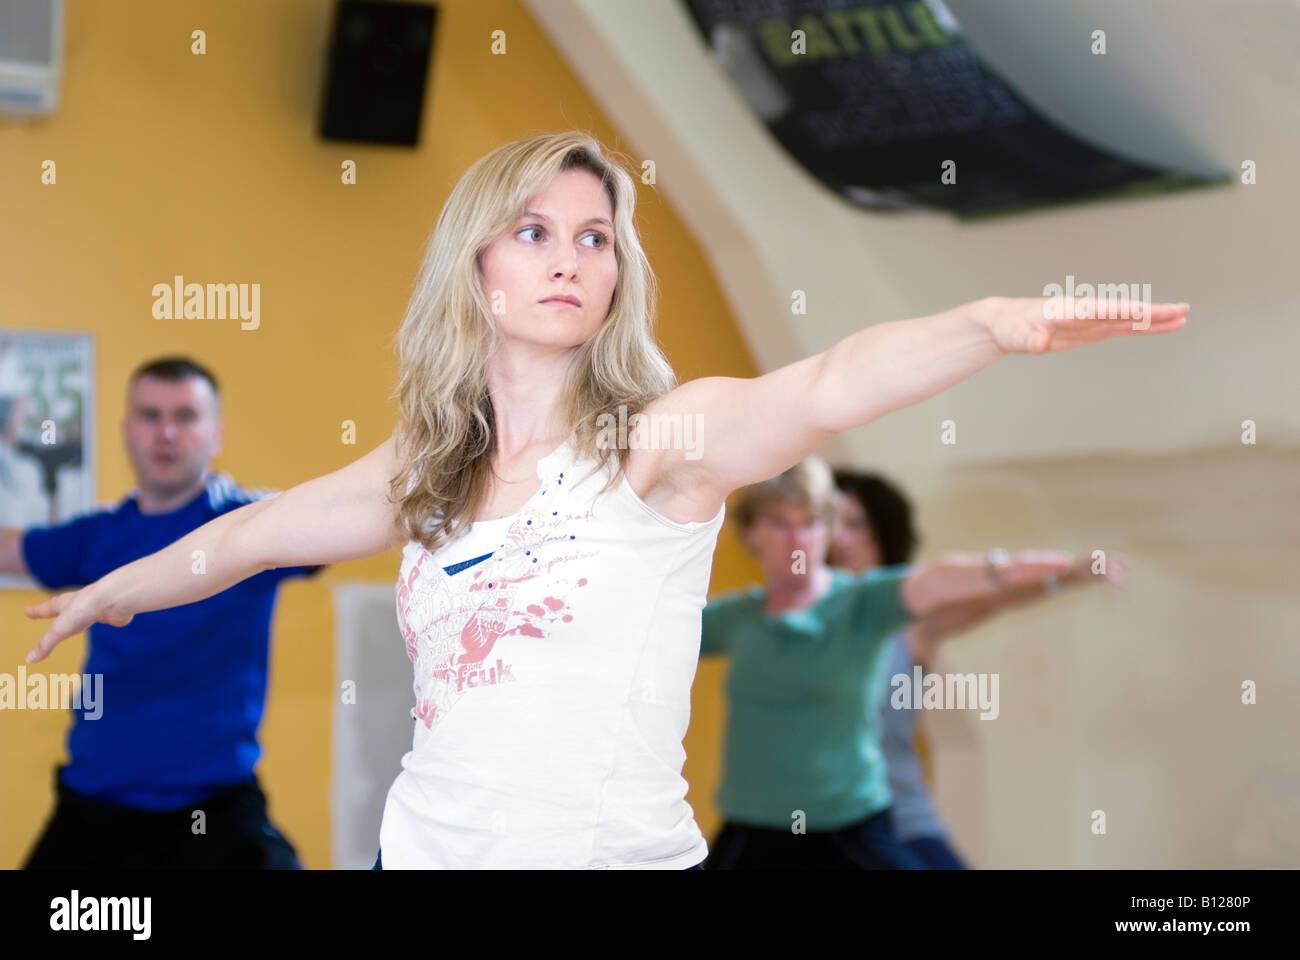 Yoga Class Girl Girls Women Men Man Vinyasa Flow Dynamic Pose